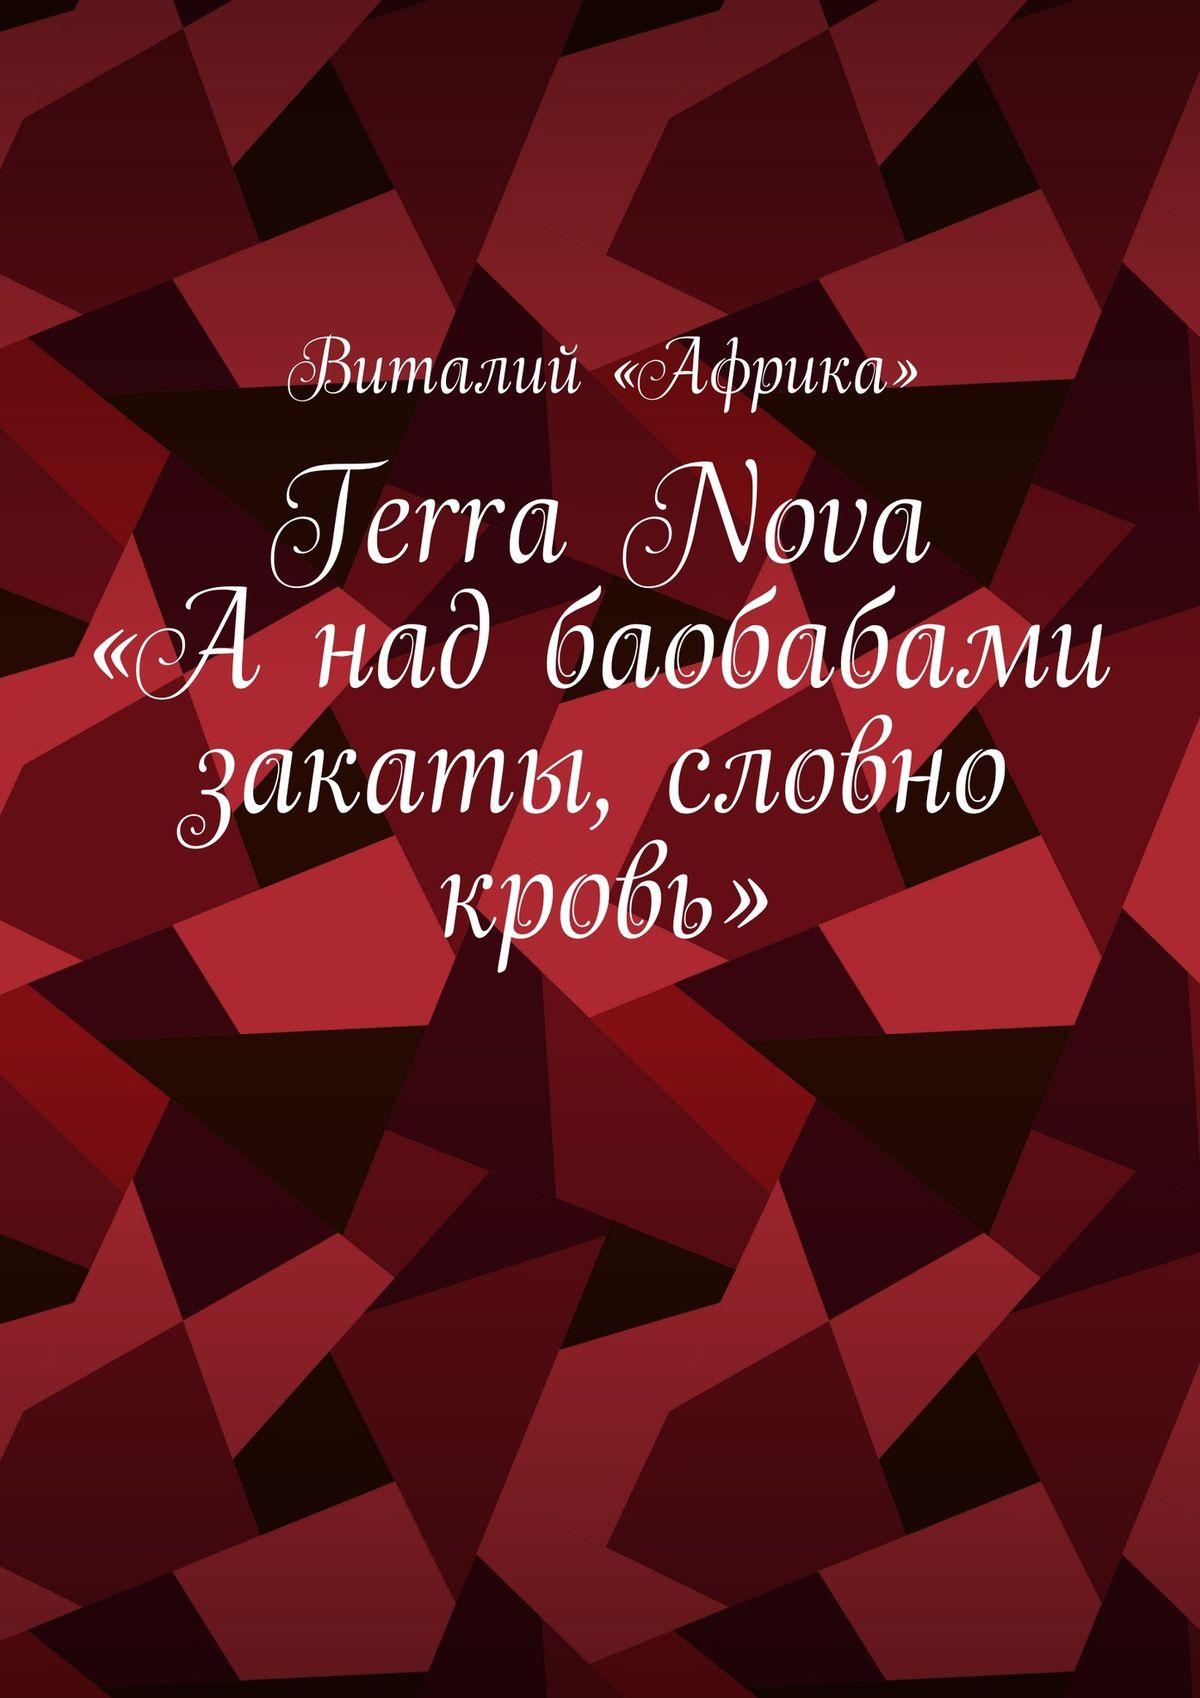 TerraNova: «Анад баобабами закаты, словно кровь»